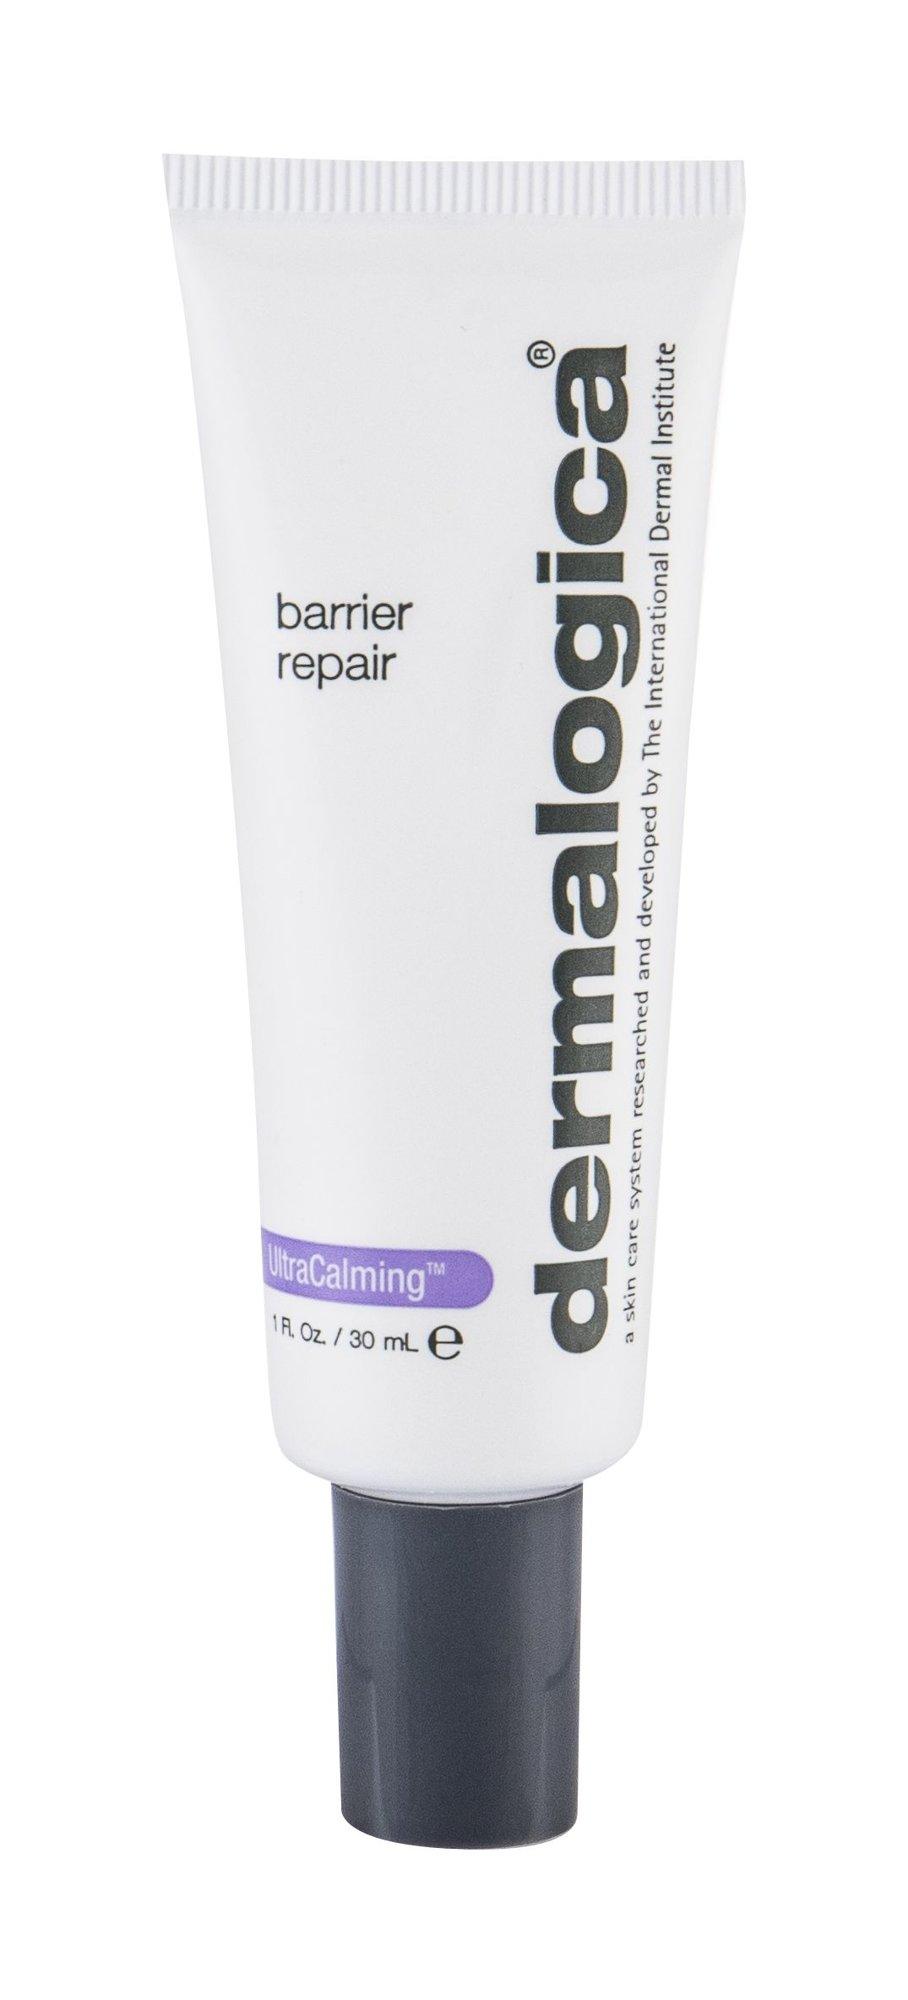 Dermalogica UltraCalming Day Cream 30ml  Barrier Repair